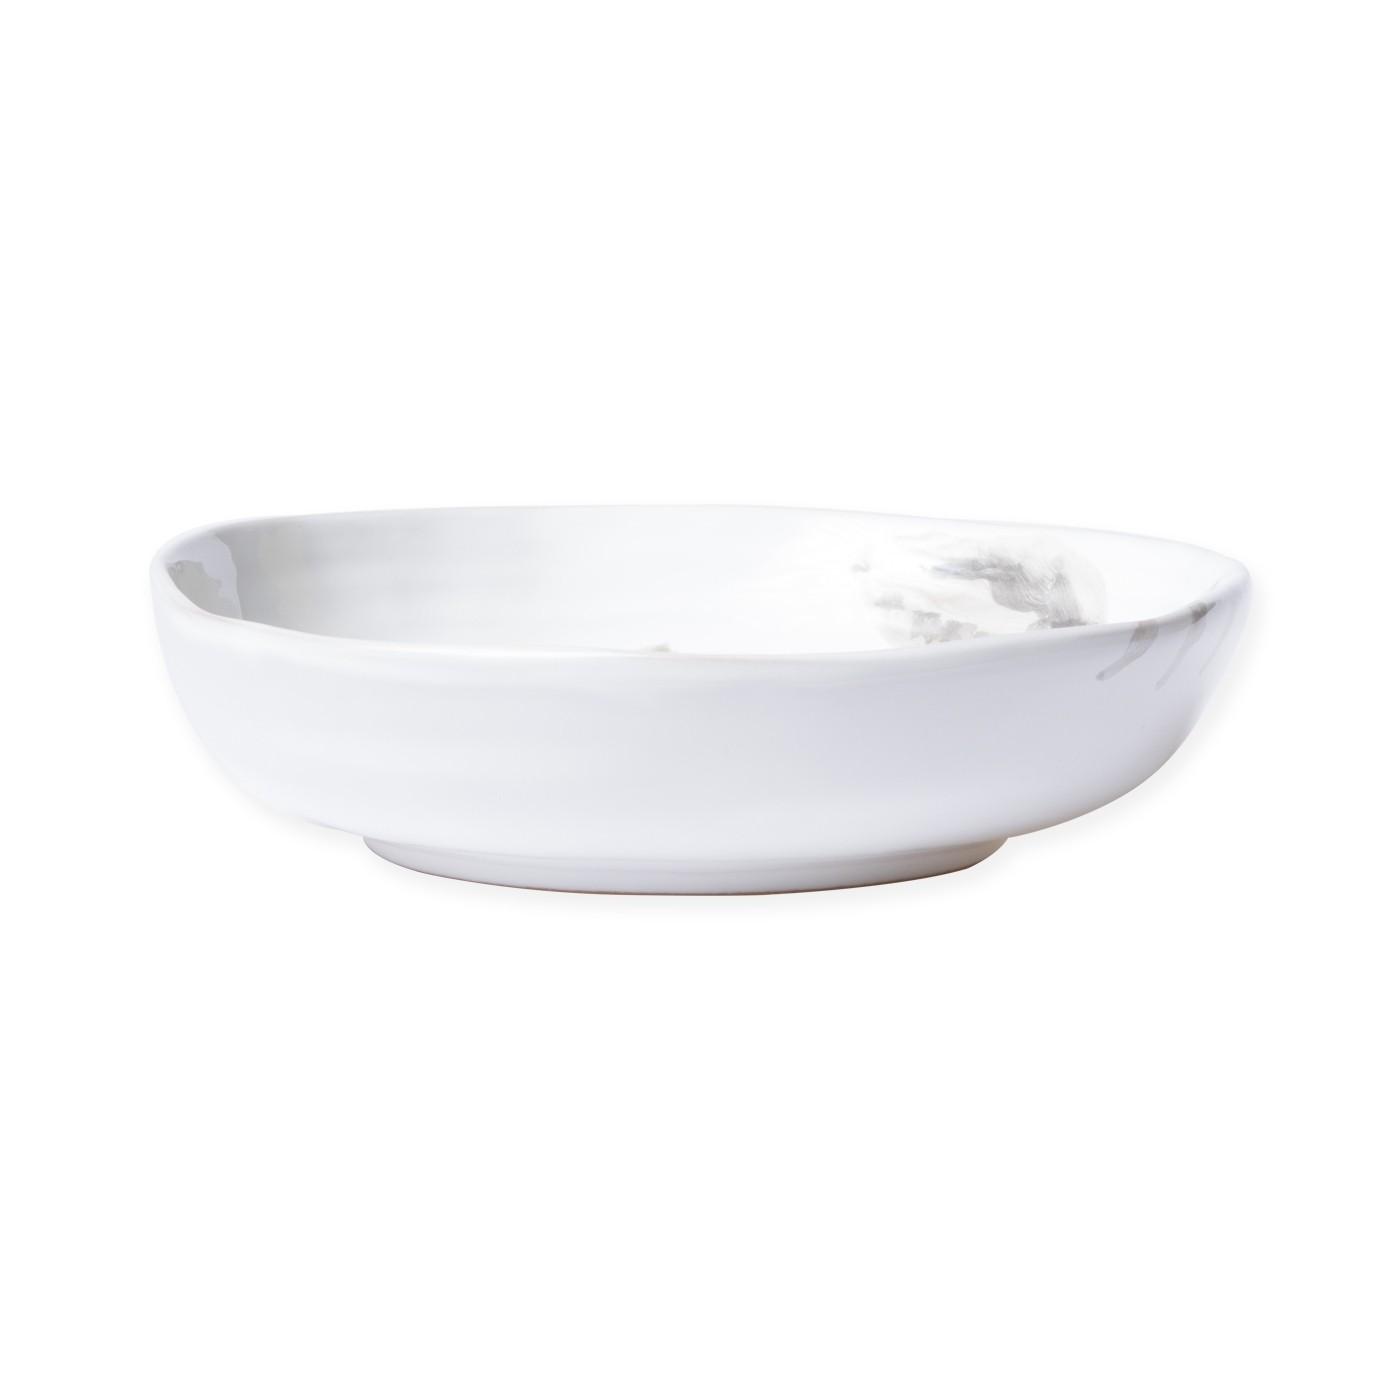 Marina Crab Pasta Bowl - 8.5 in. d 2 in. h  sc 1 st  Gracious Style & Vietri Marina Crab Dinnerware   Gracious Style